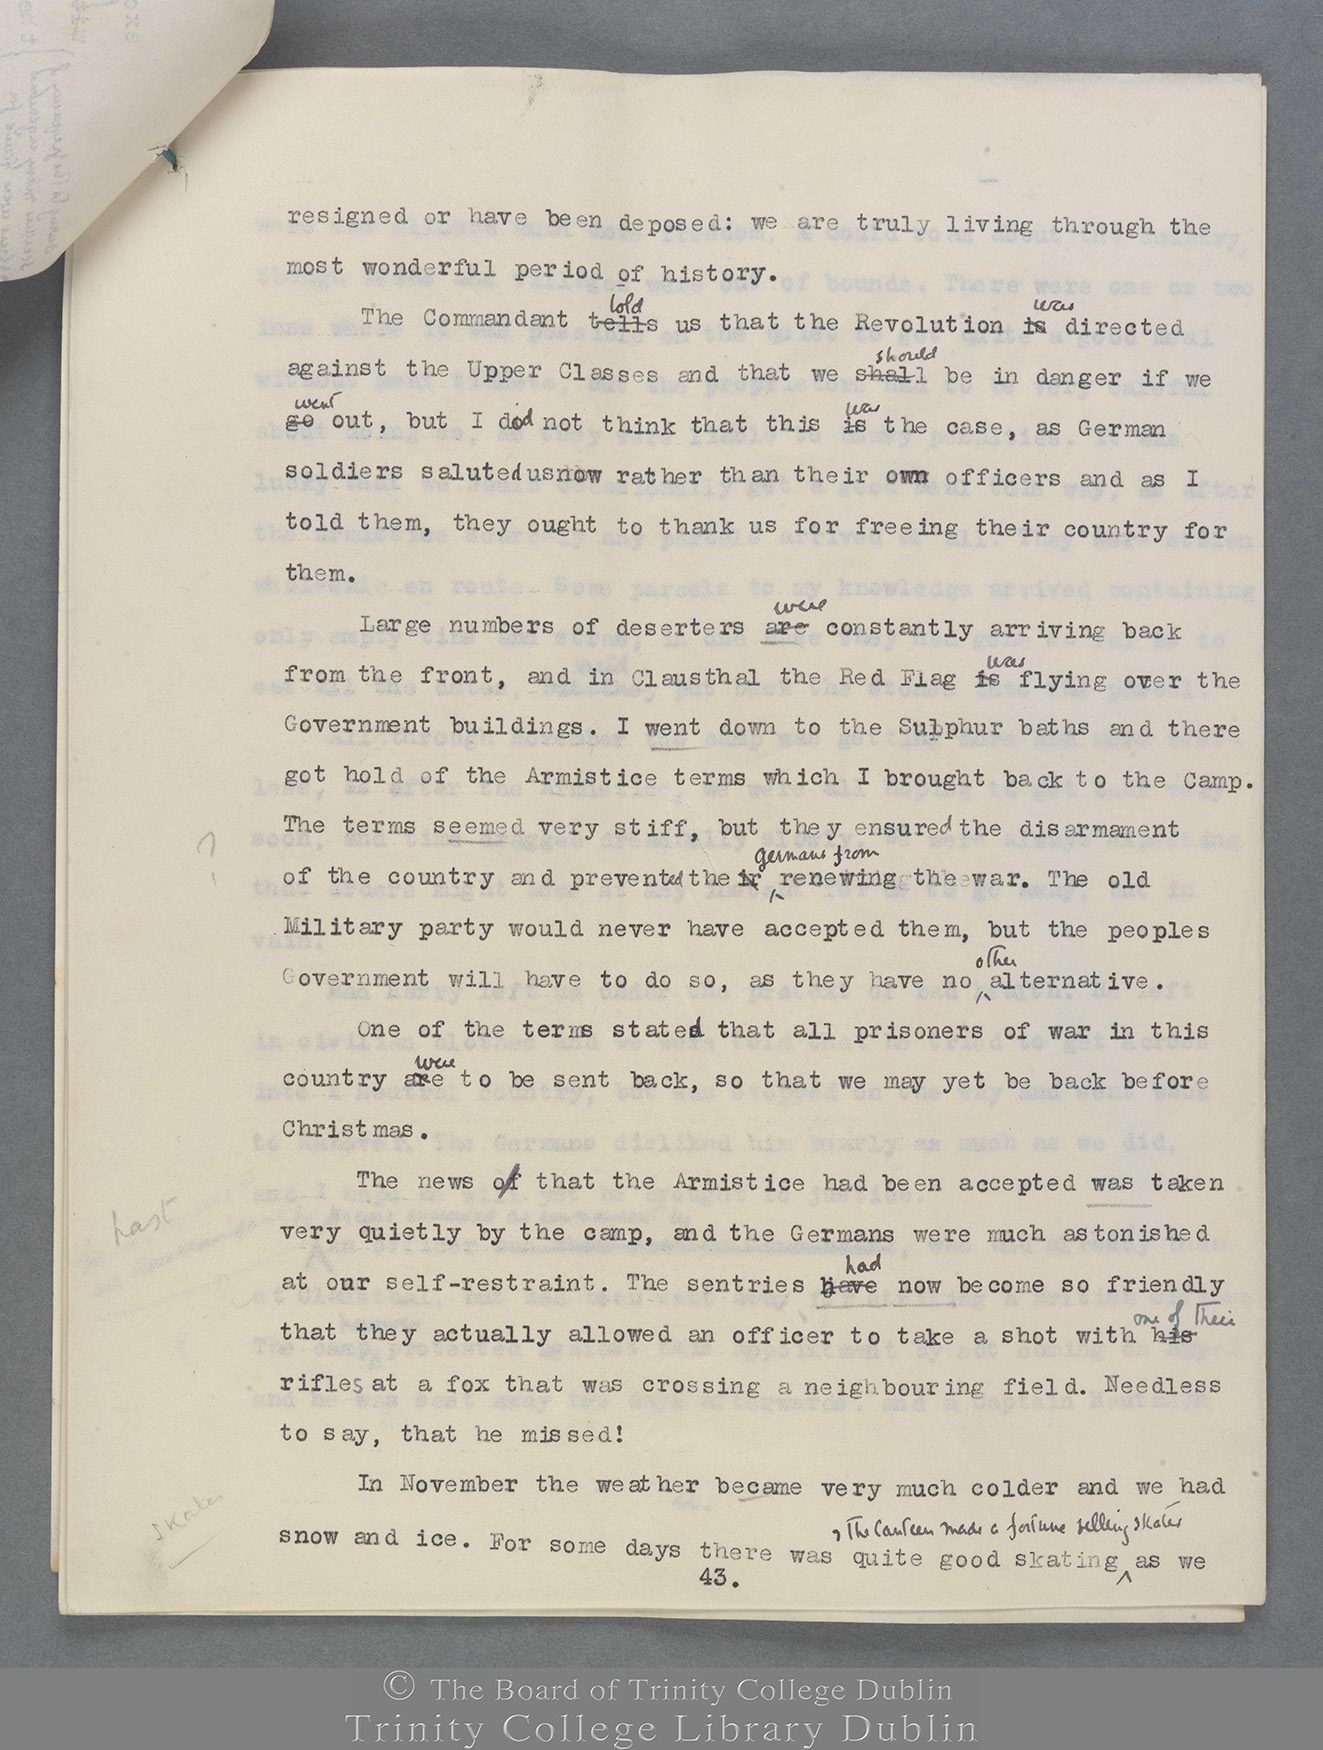 TCD MS 10823 folio 43 recto